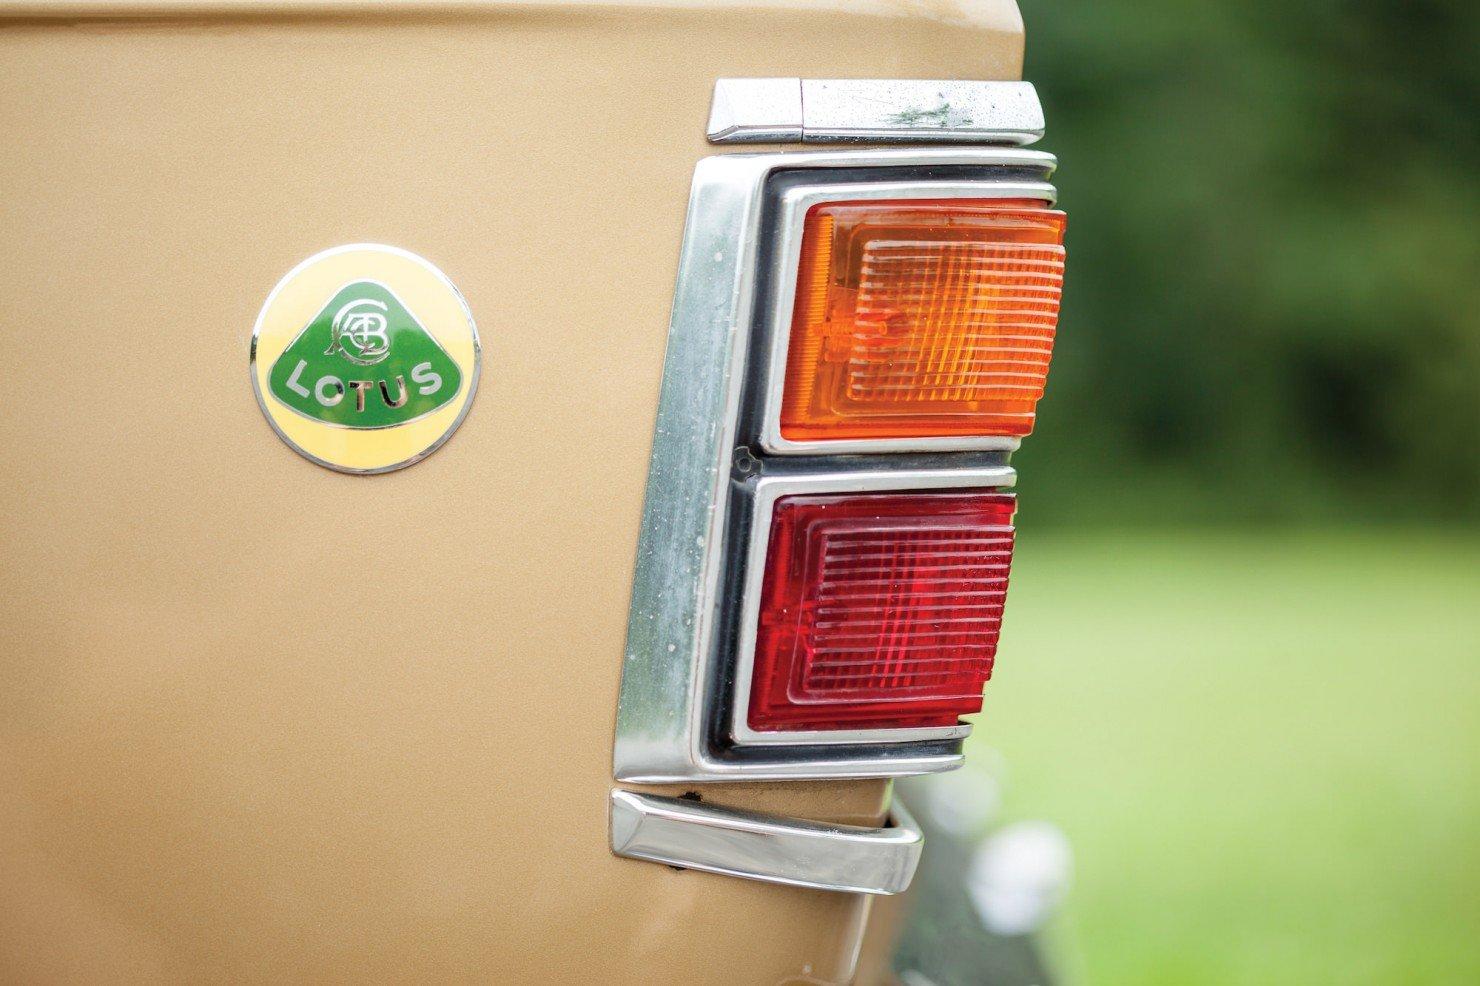 Ford Cortina Lotus 4